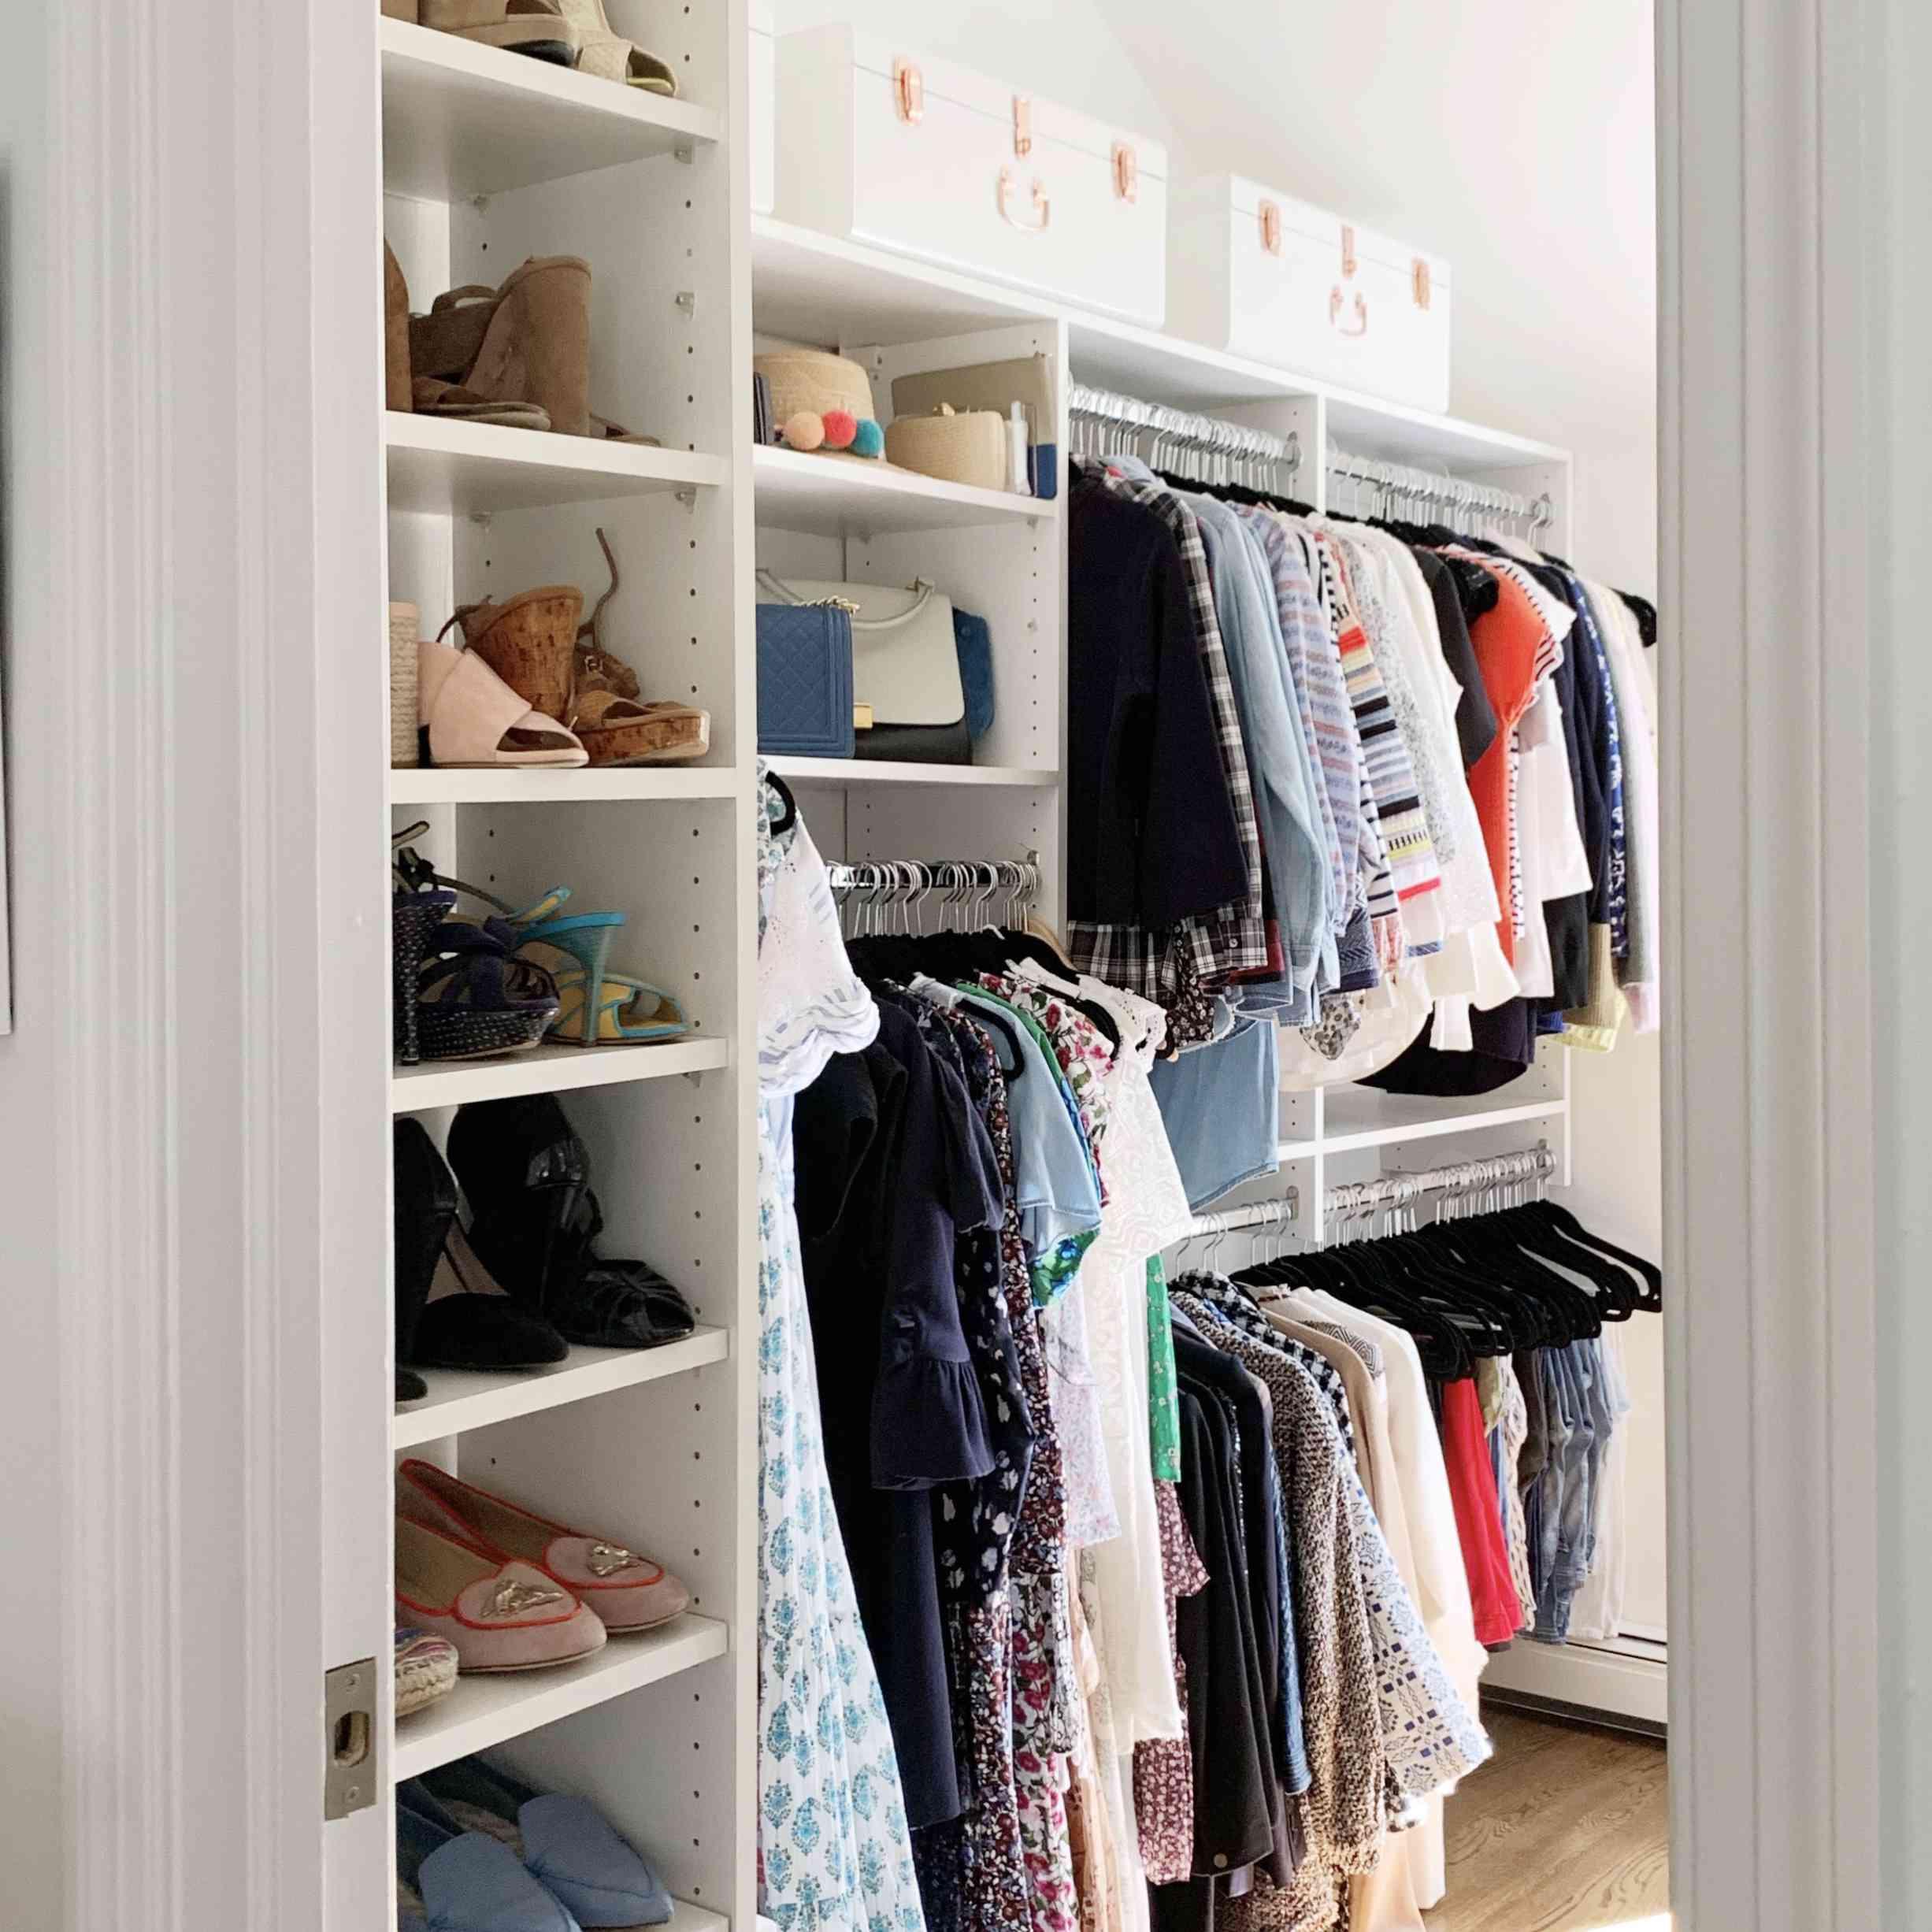 Closet with shoe organizer